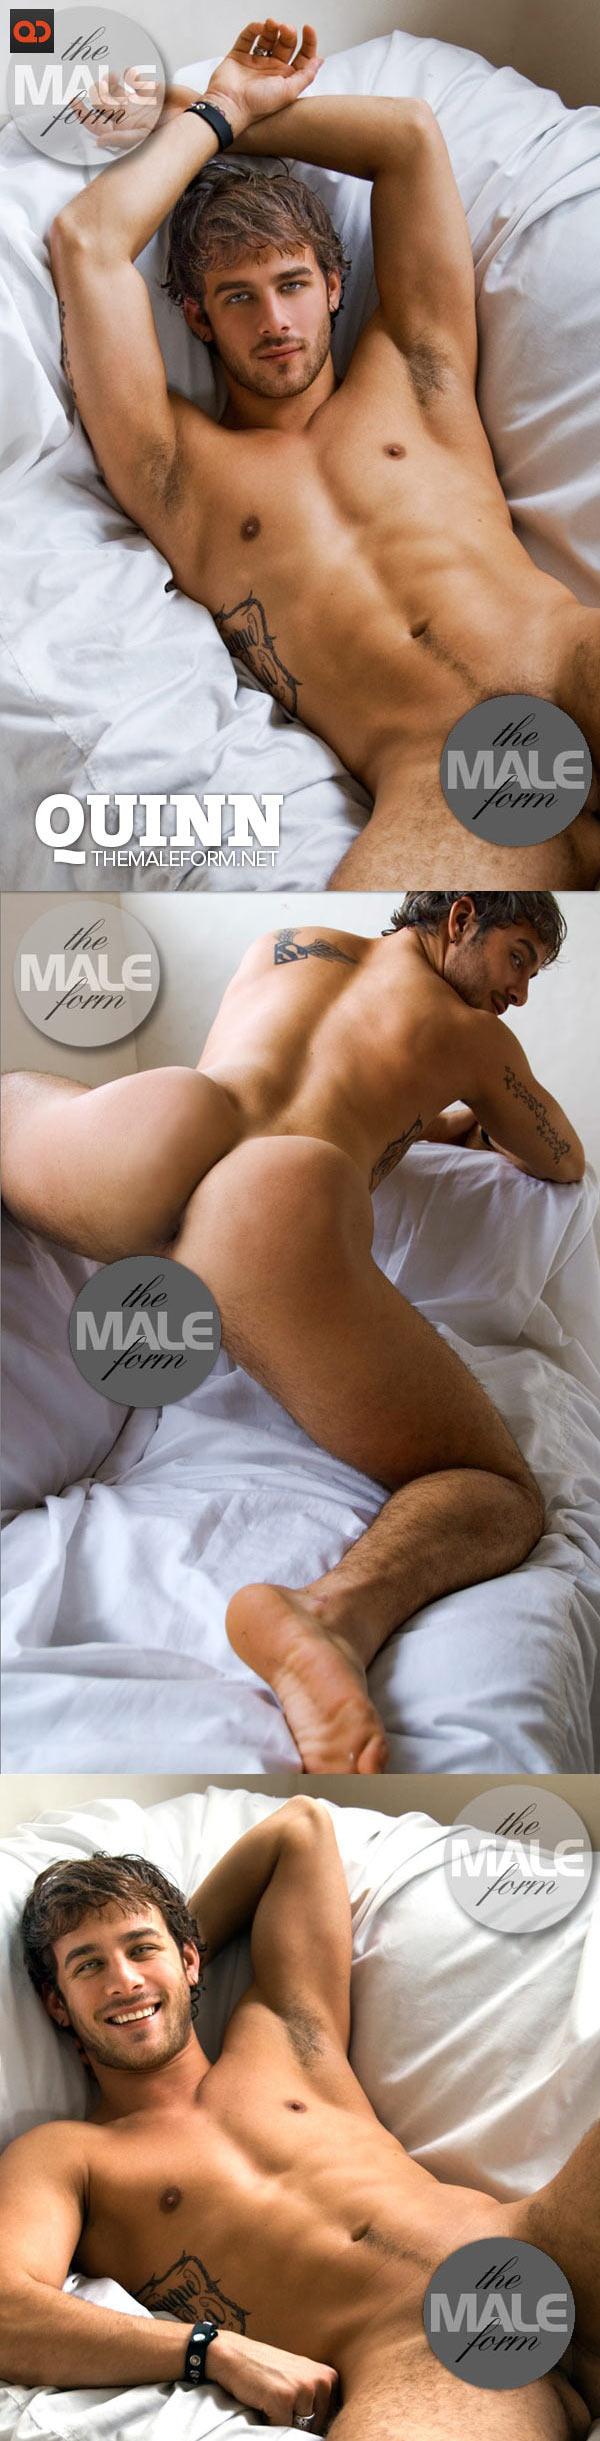 Kurt madison nude bottom charming